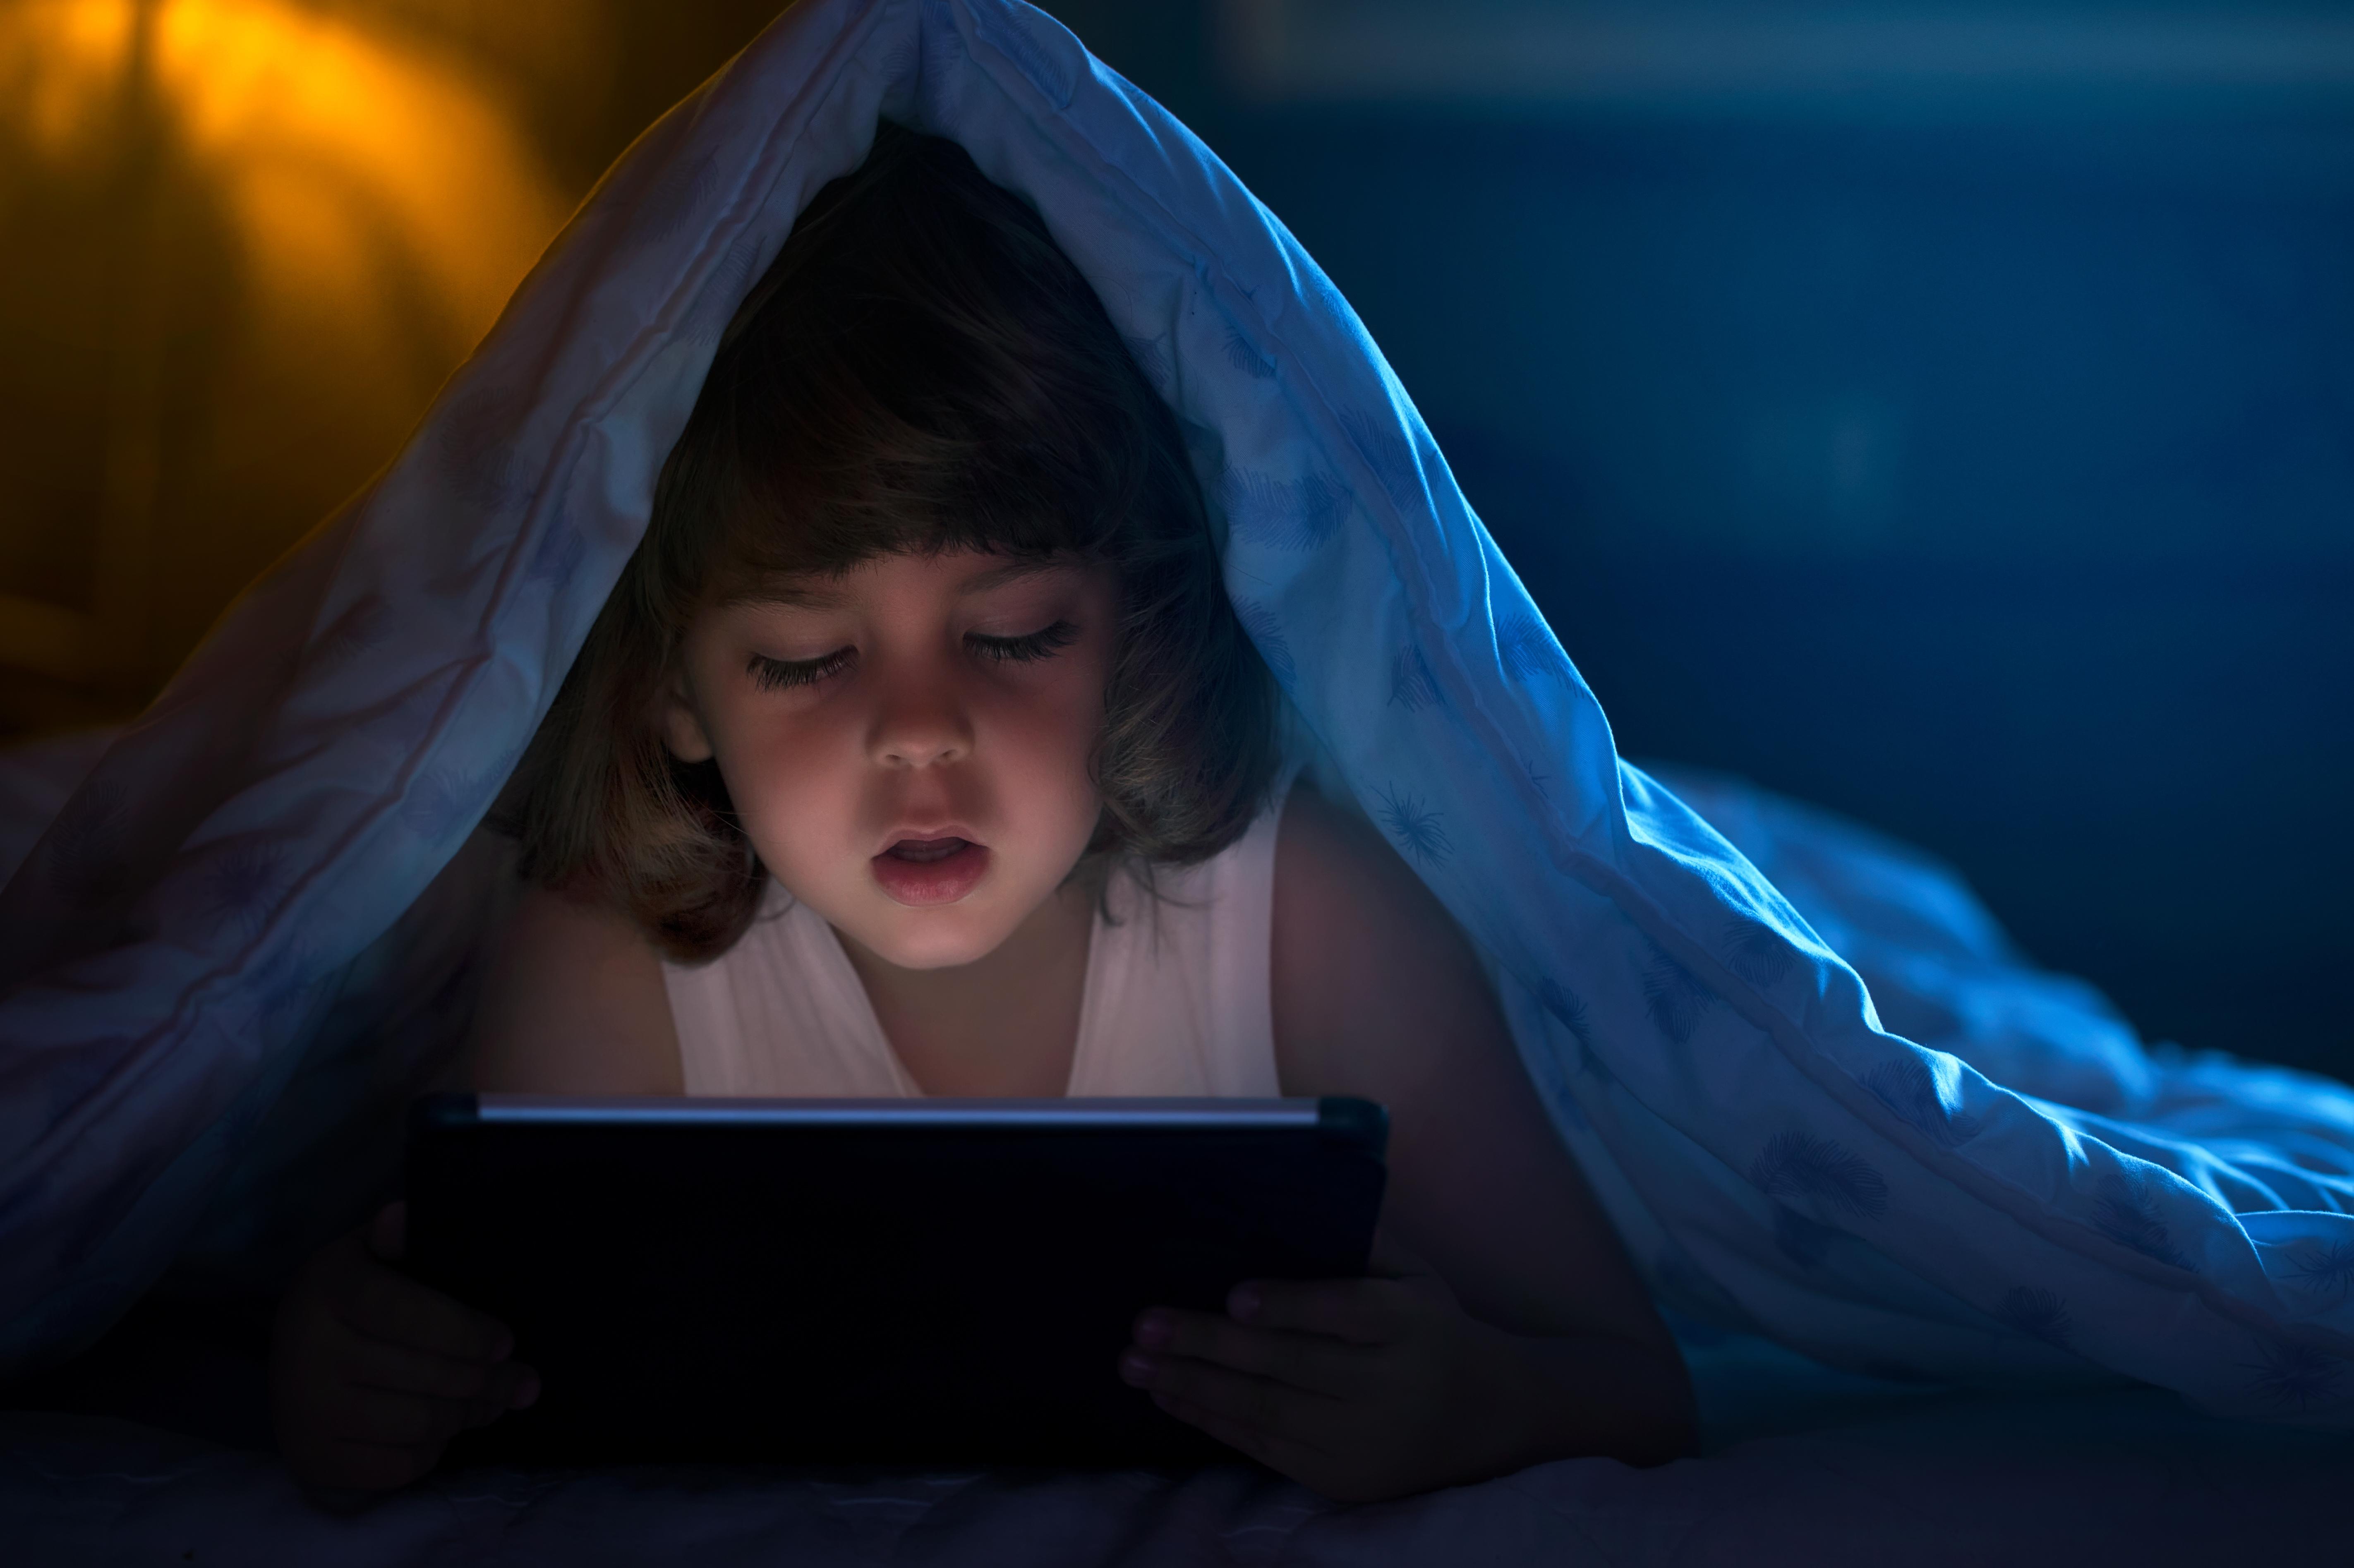 Screen use and sleep